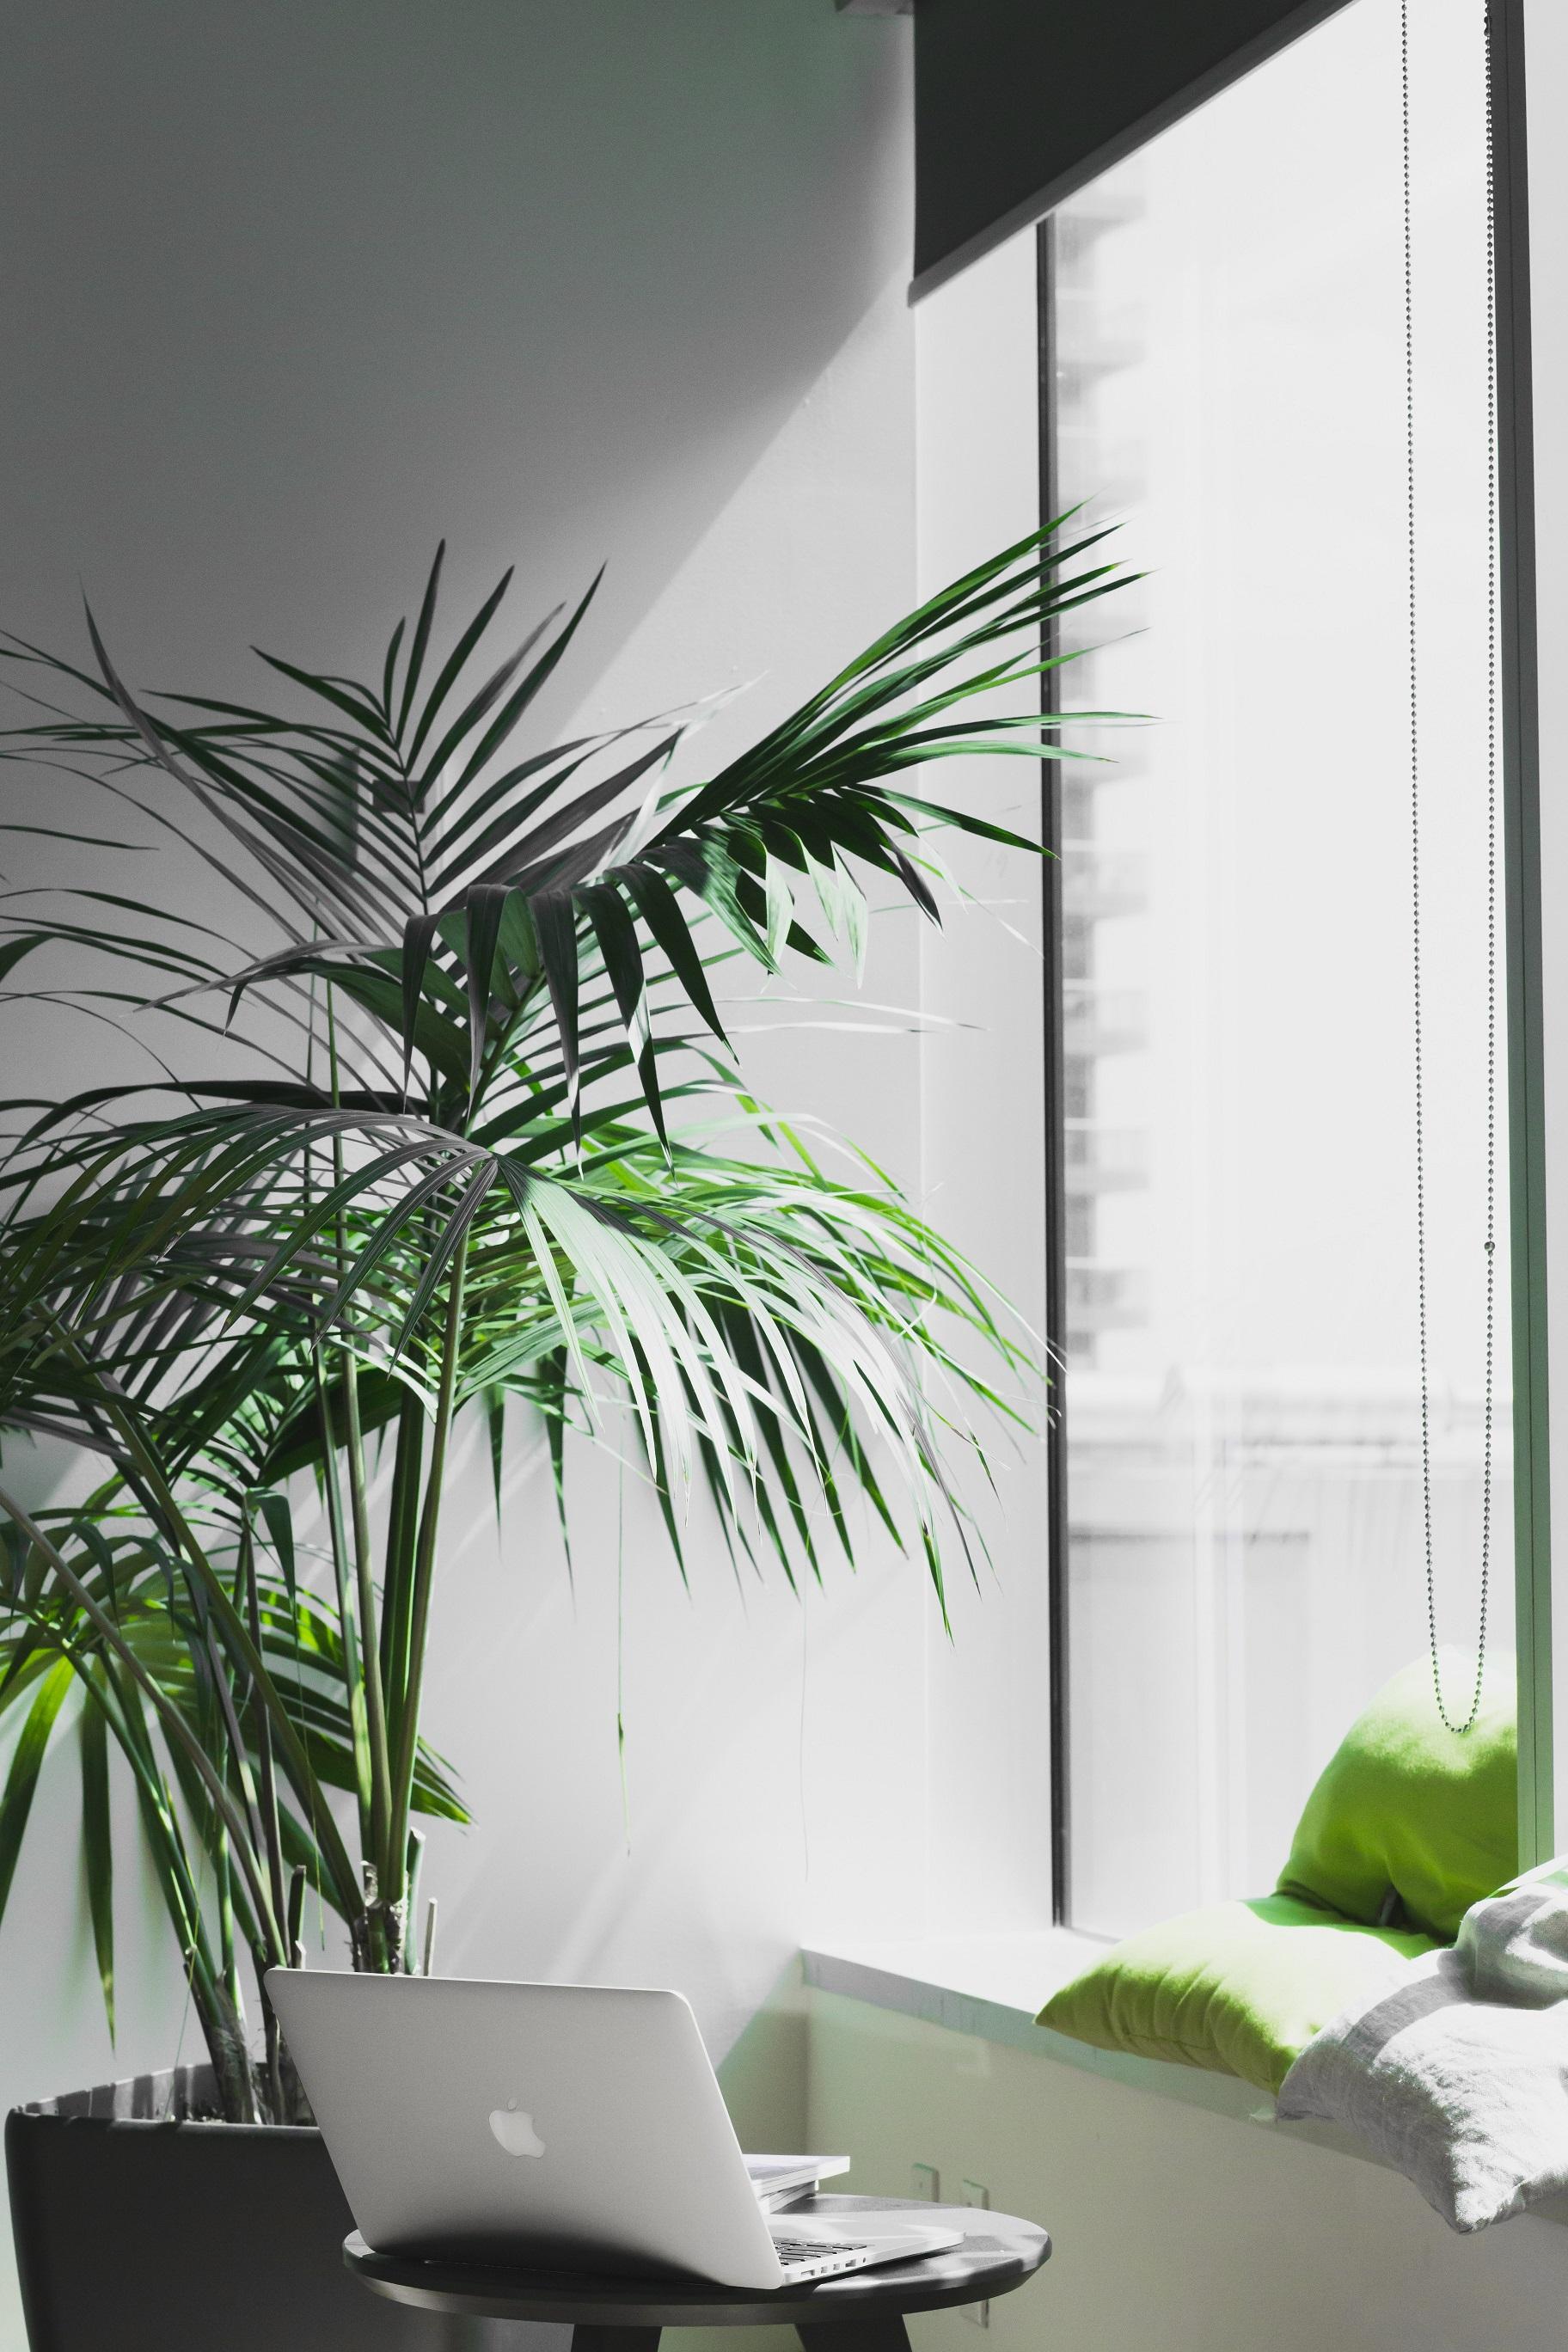 Büro mit Grünpflanze